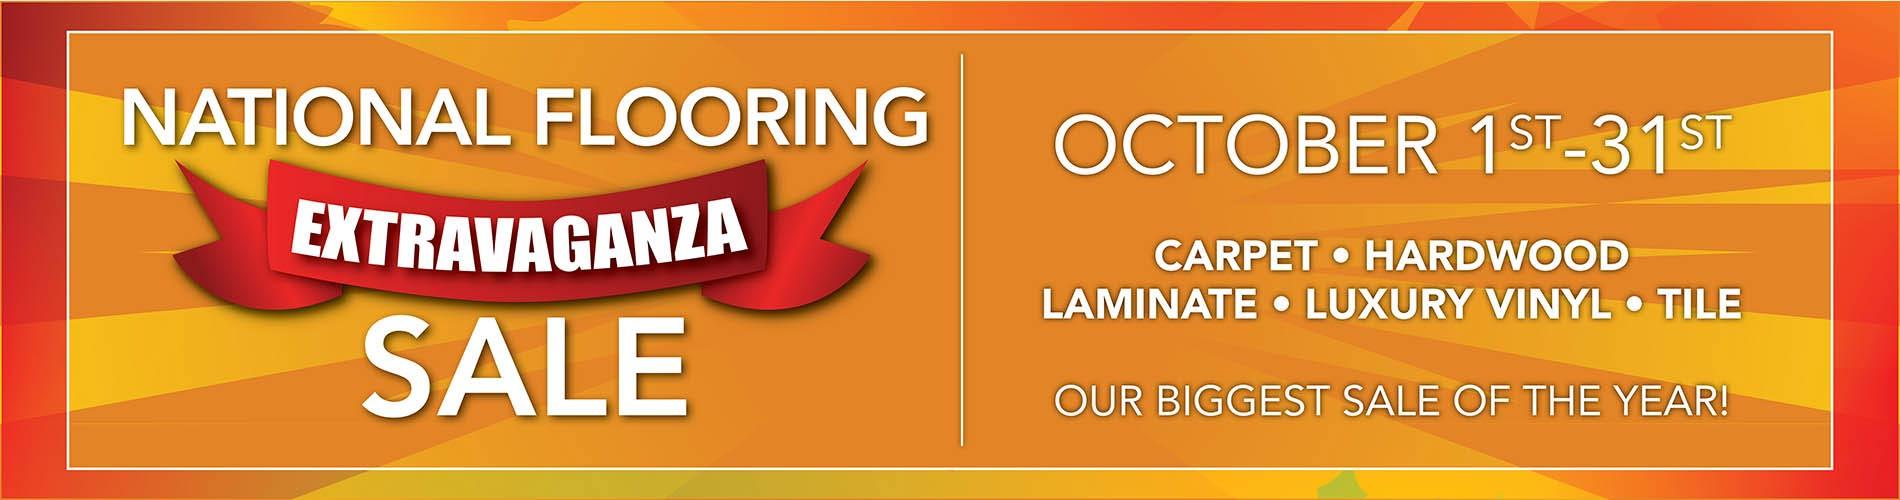 National Flooring Extravaganza Sale Oct 1st-31st | Carpet - Hardwood - Laminate - Luxury Vinyl - Tile | Our Biggest Sale of the Year!